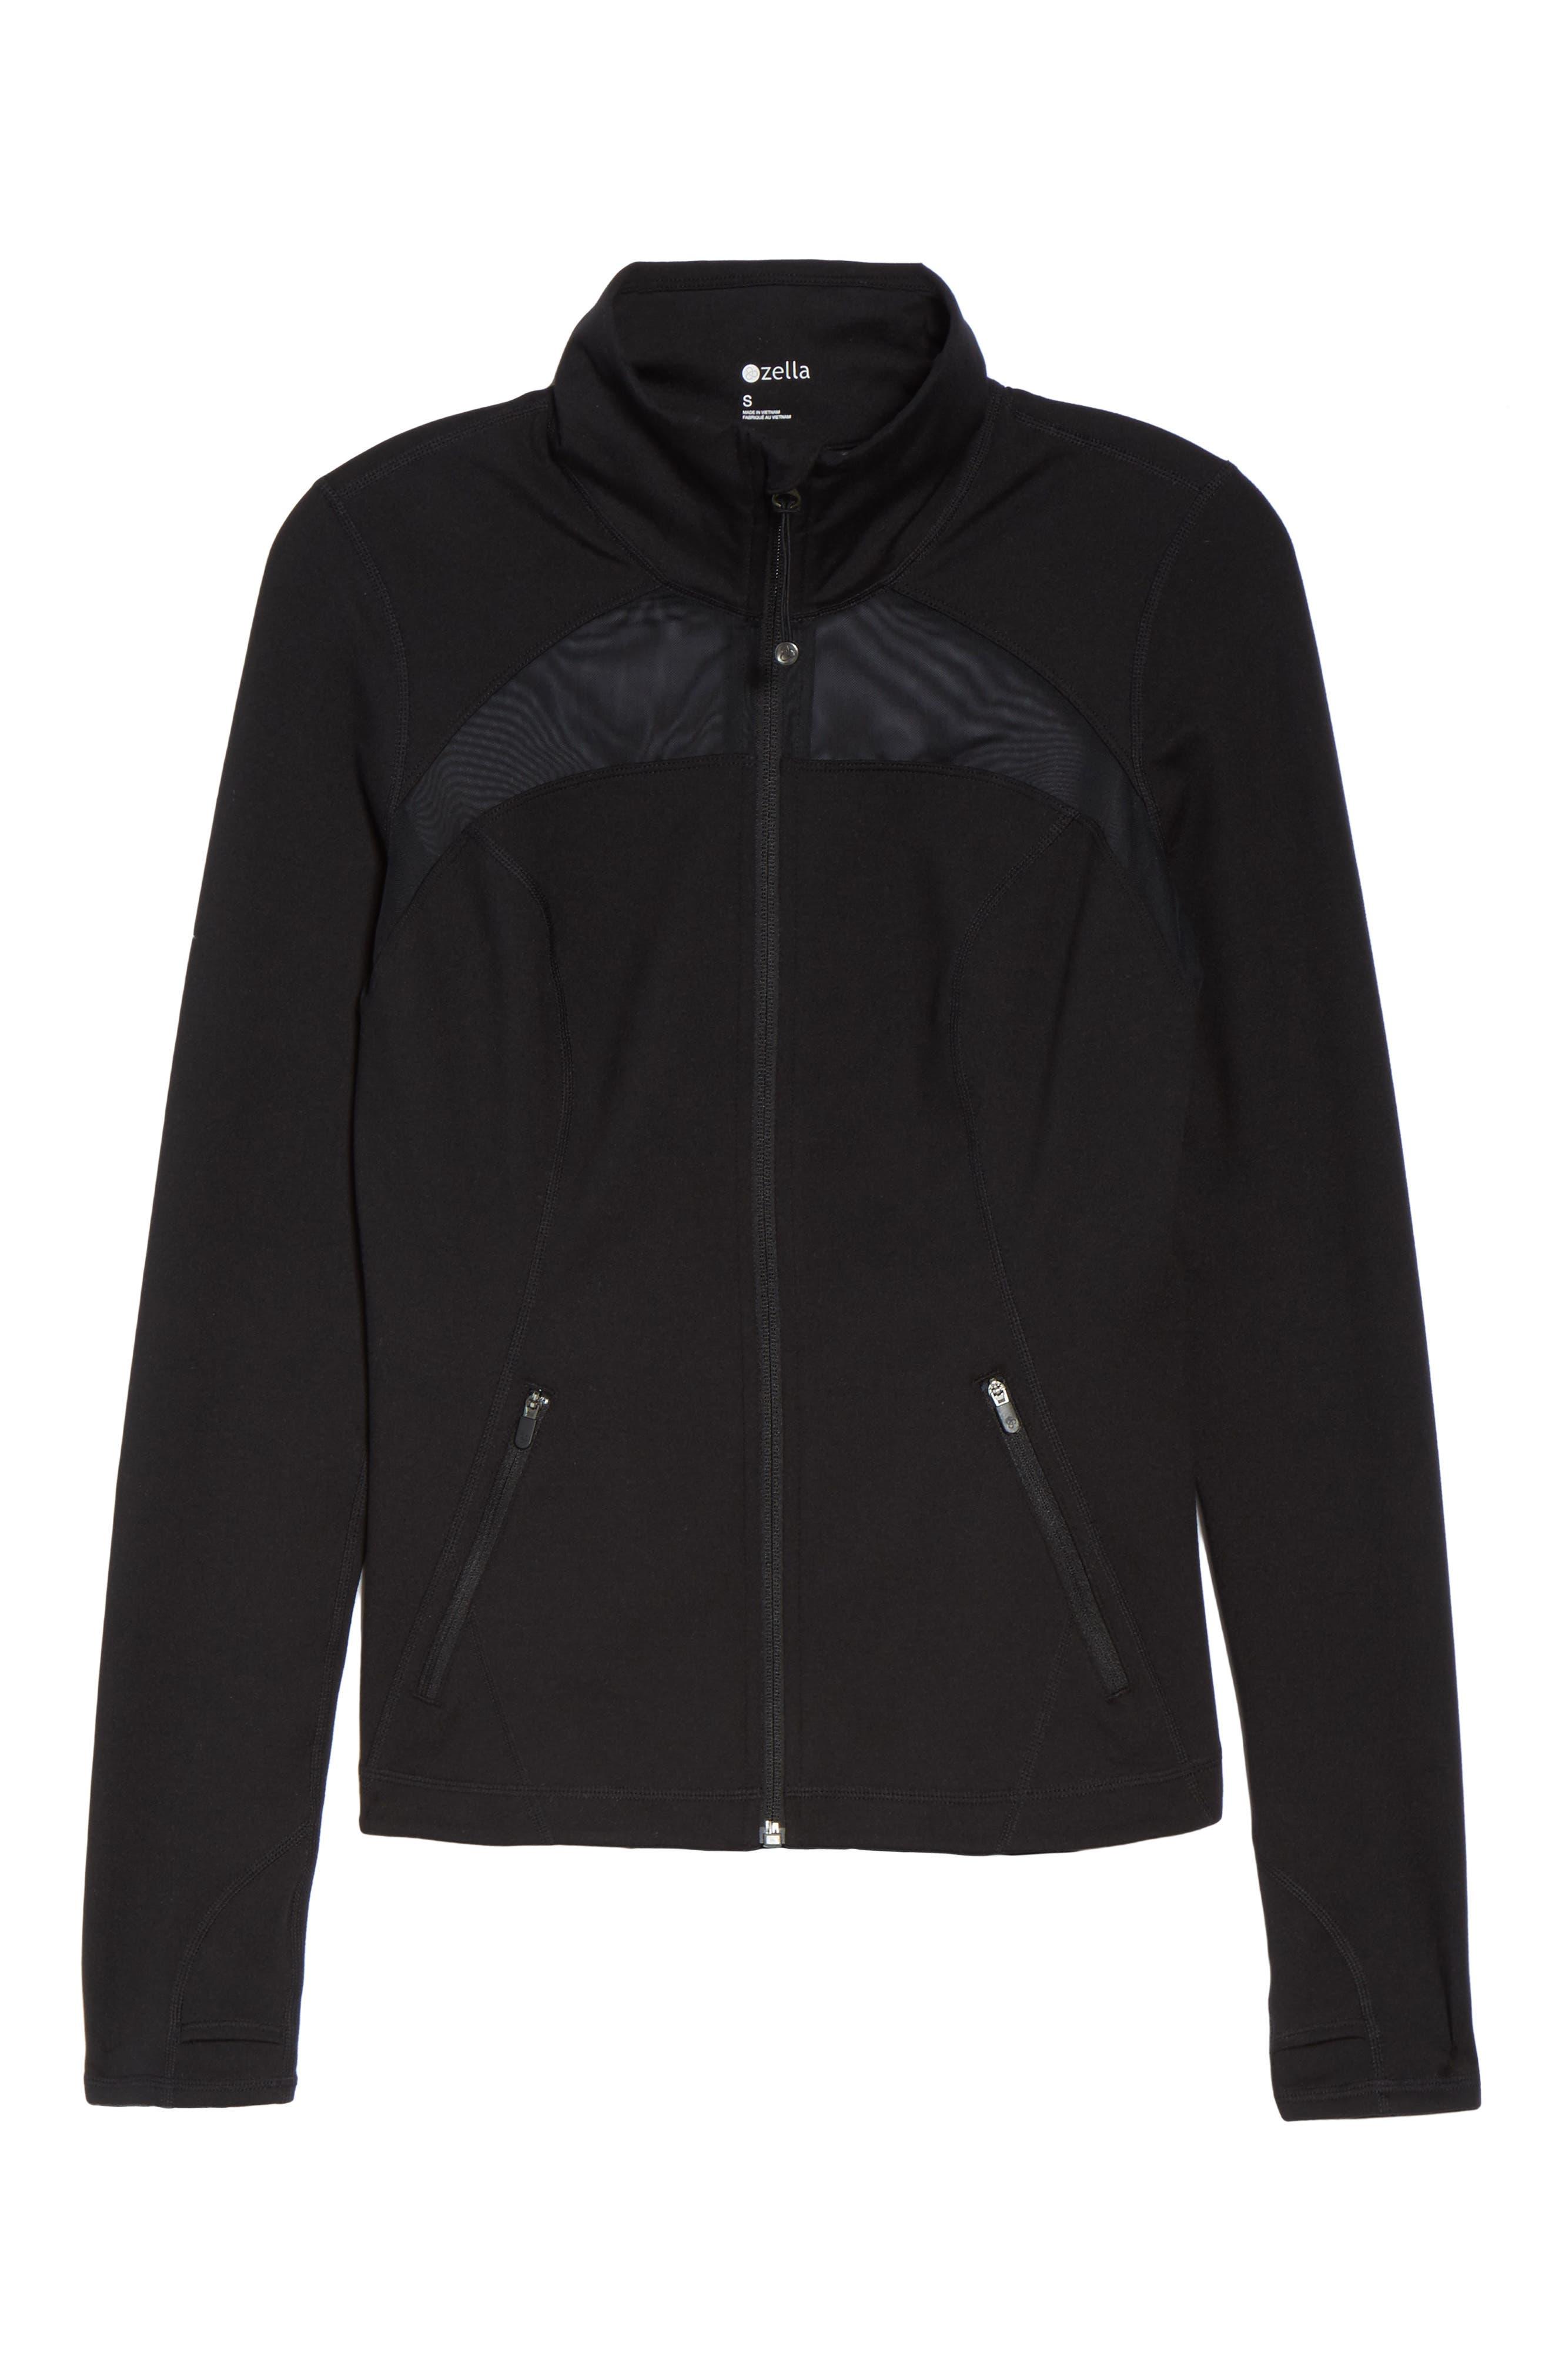 Revolve Jacket,                             Alternate thumbnail 7, color,                             Black